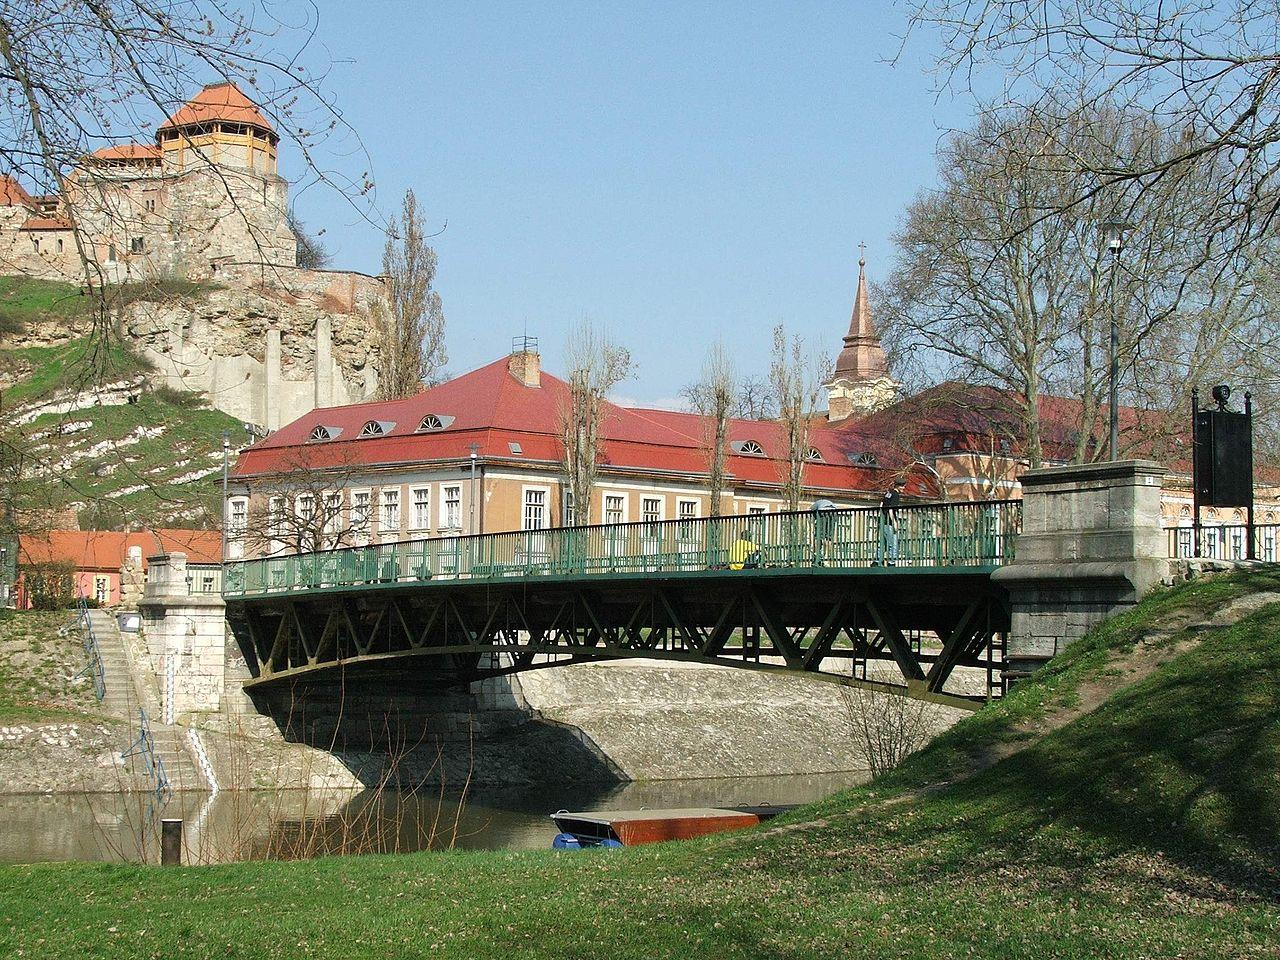 1280px-Esztergom_Kossuth_híd_a_szigetről.JPG